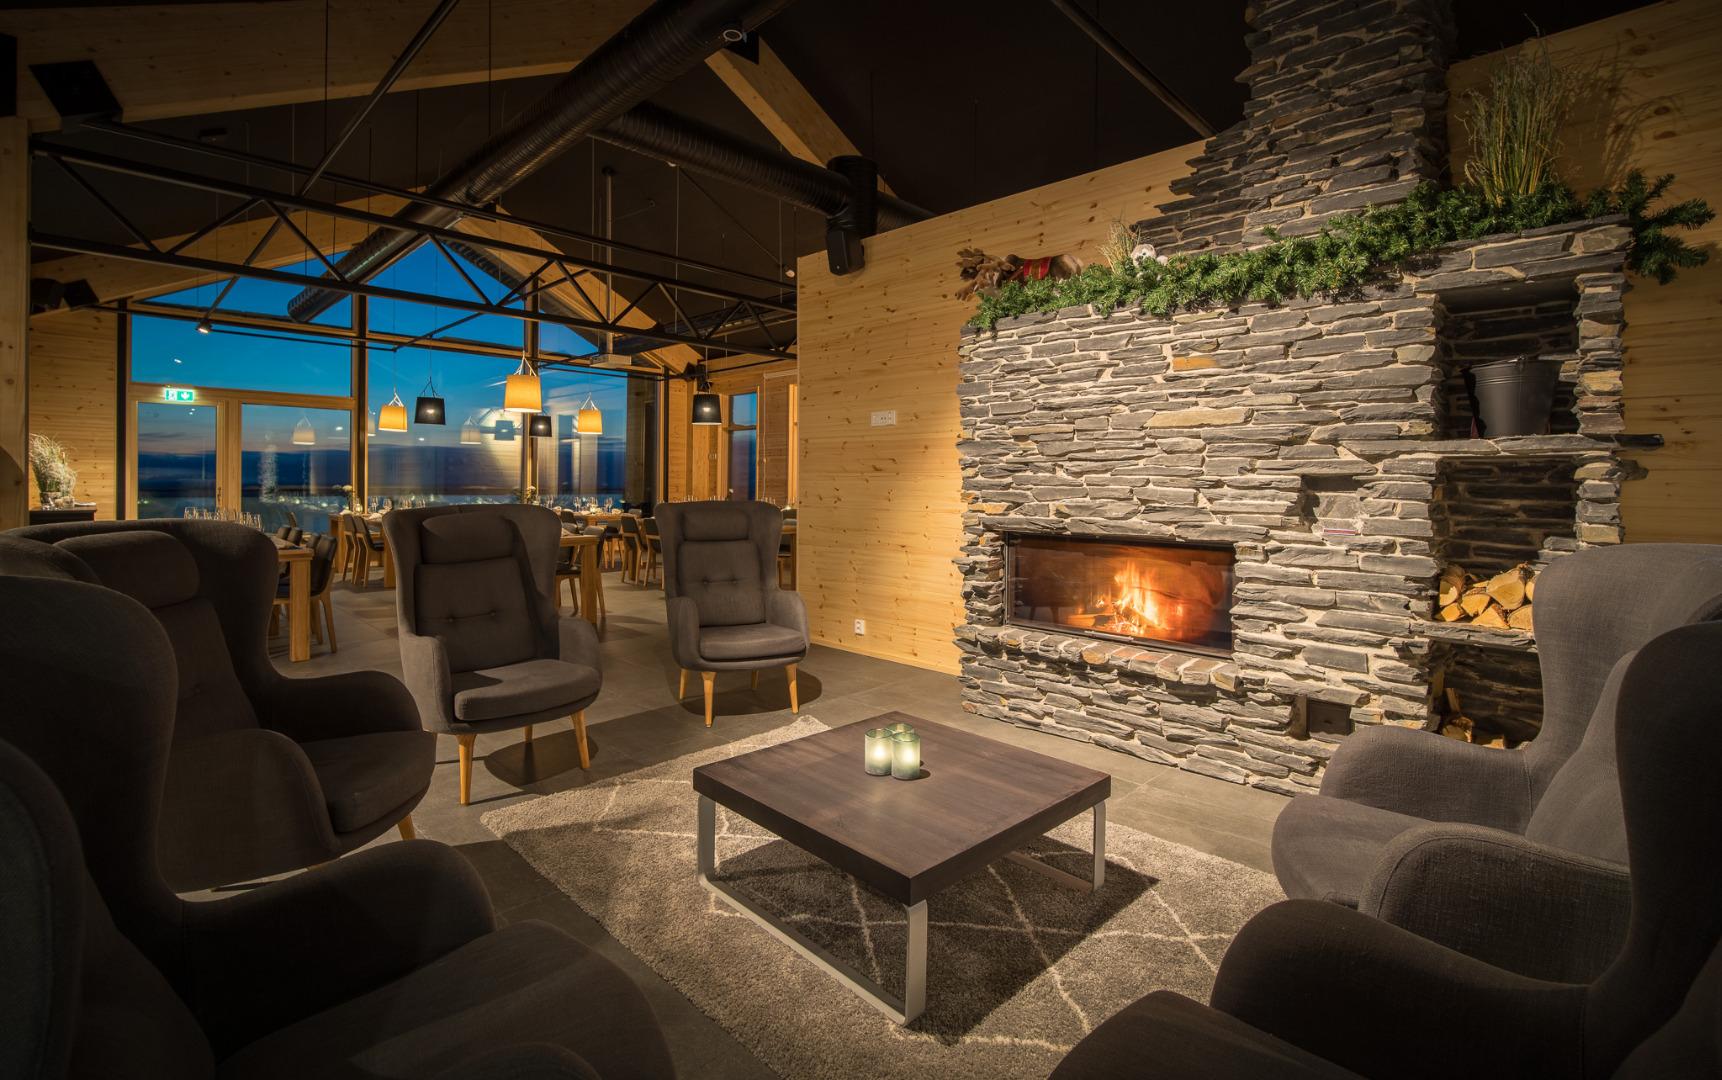 Santa's Star Arctic Hotel - Bar and Reception